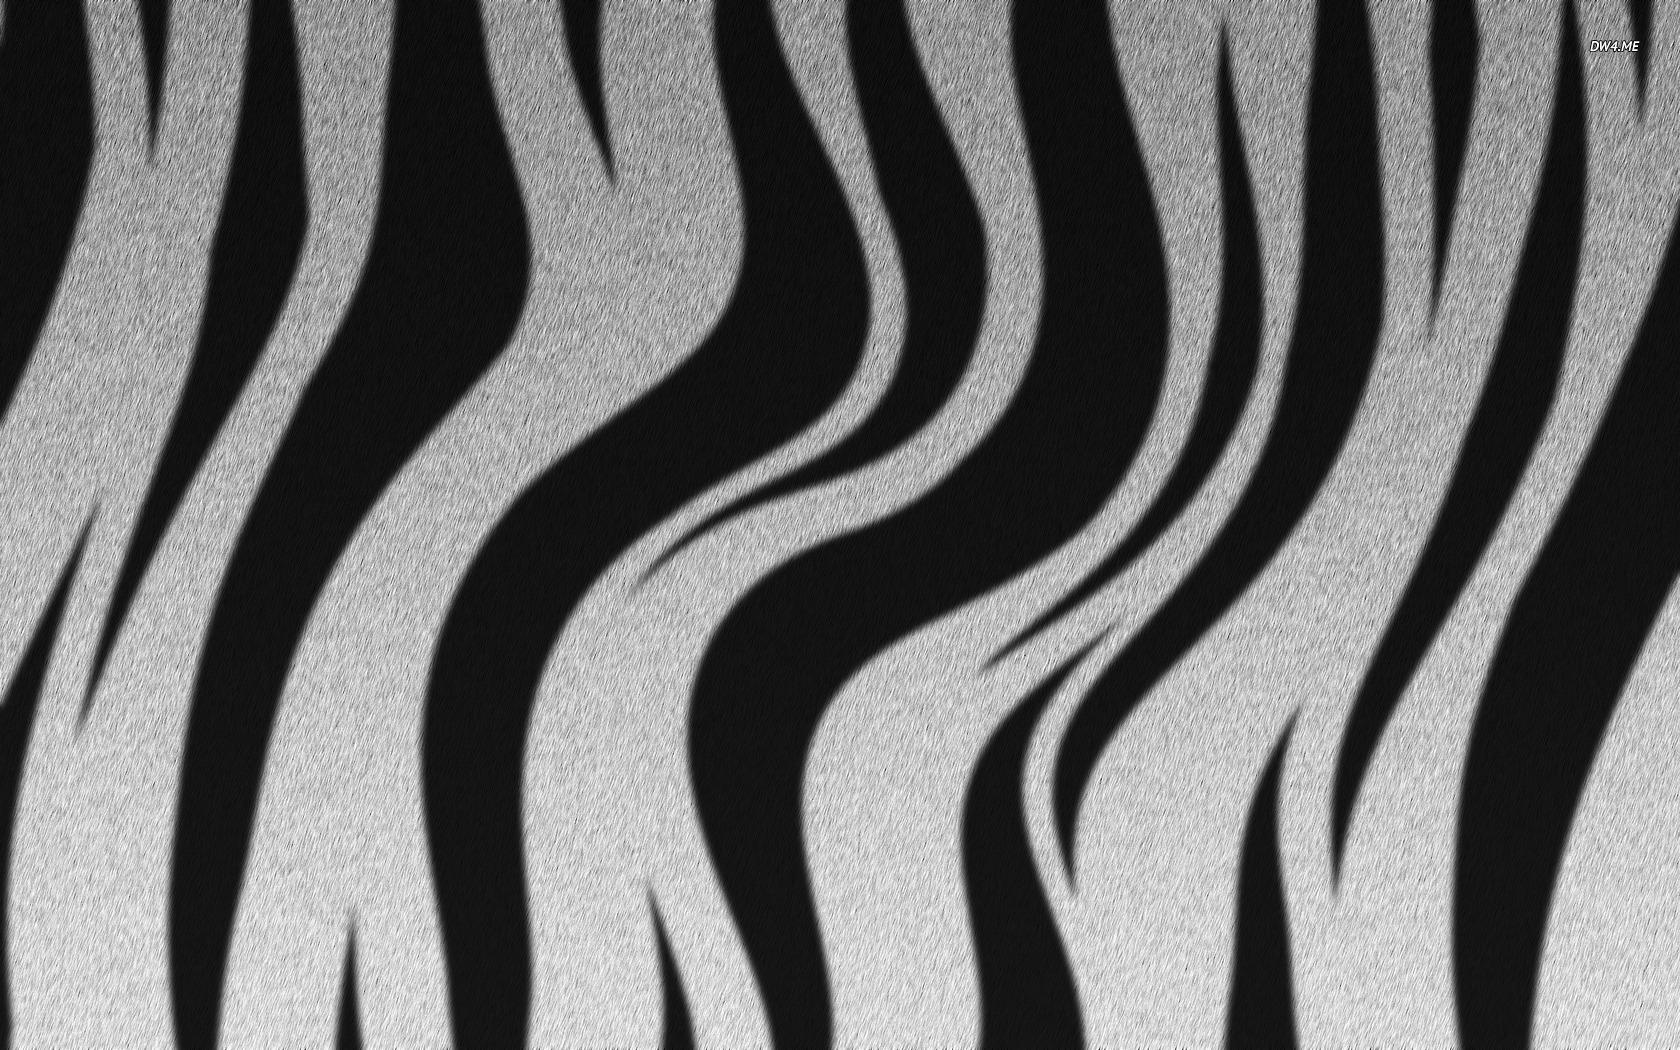 Zebra stripes wallpaper   Digital Art wallpapers   752 1680x1050